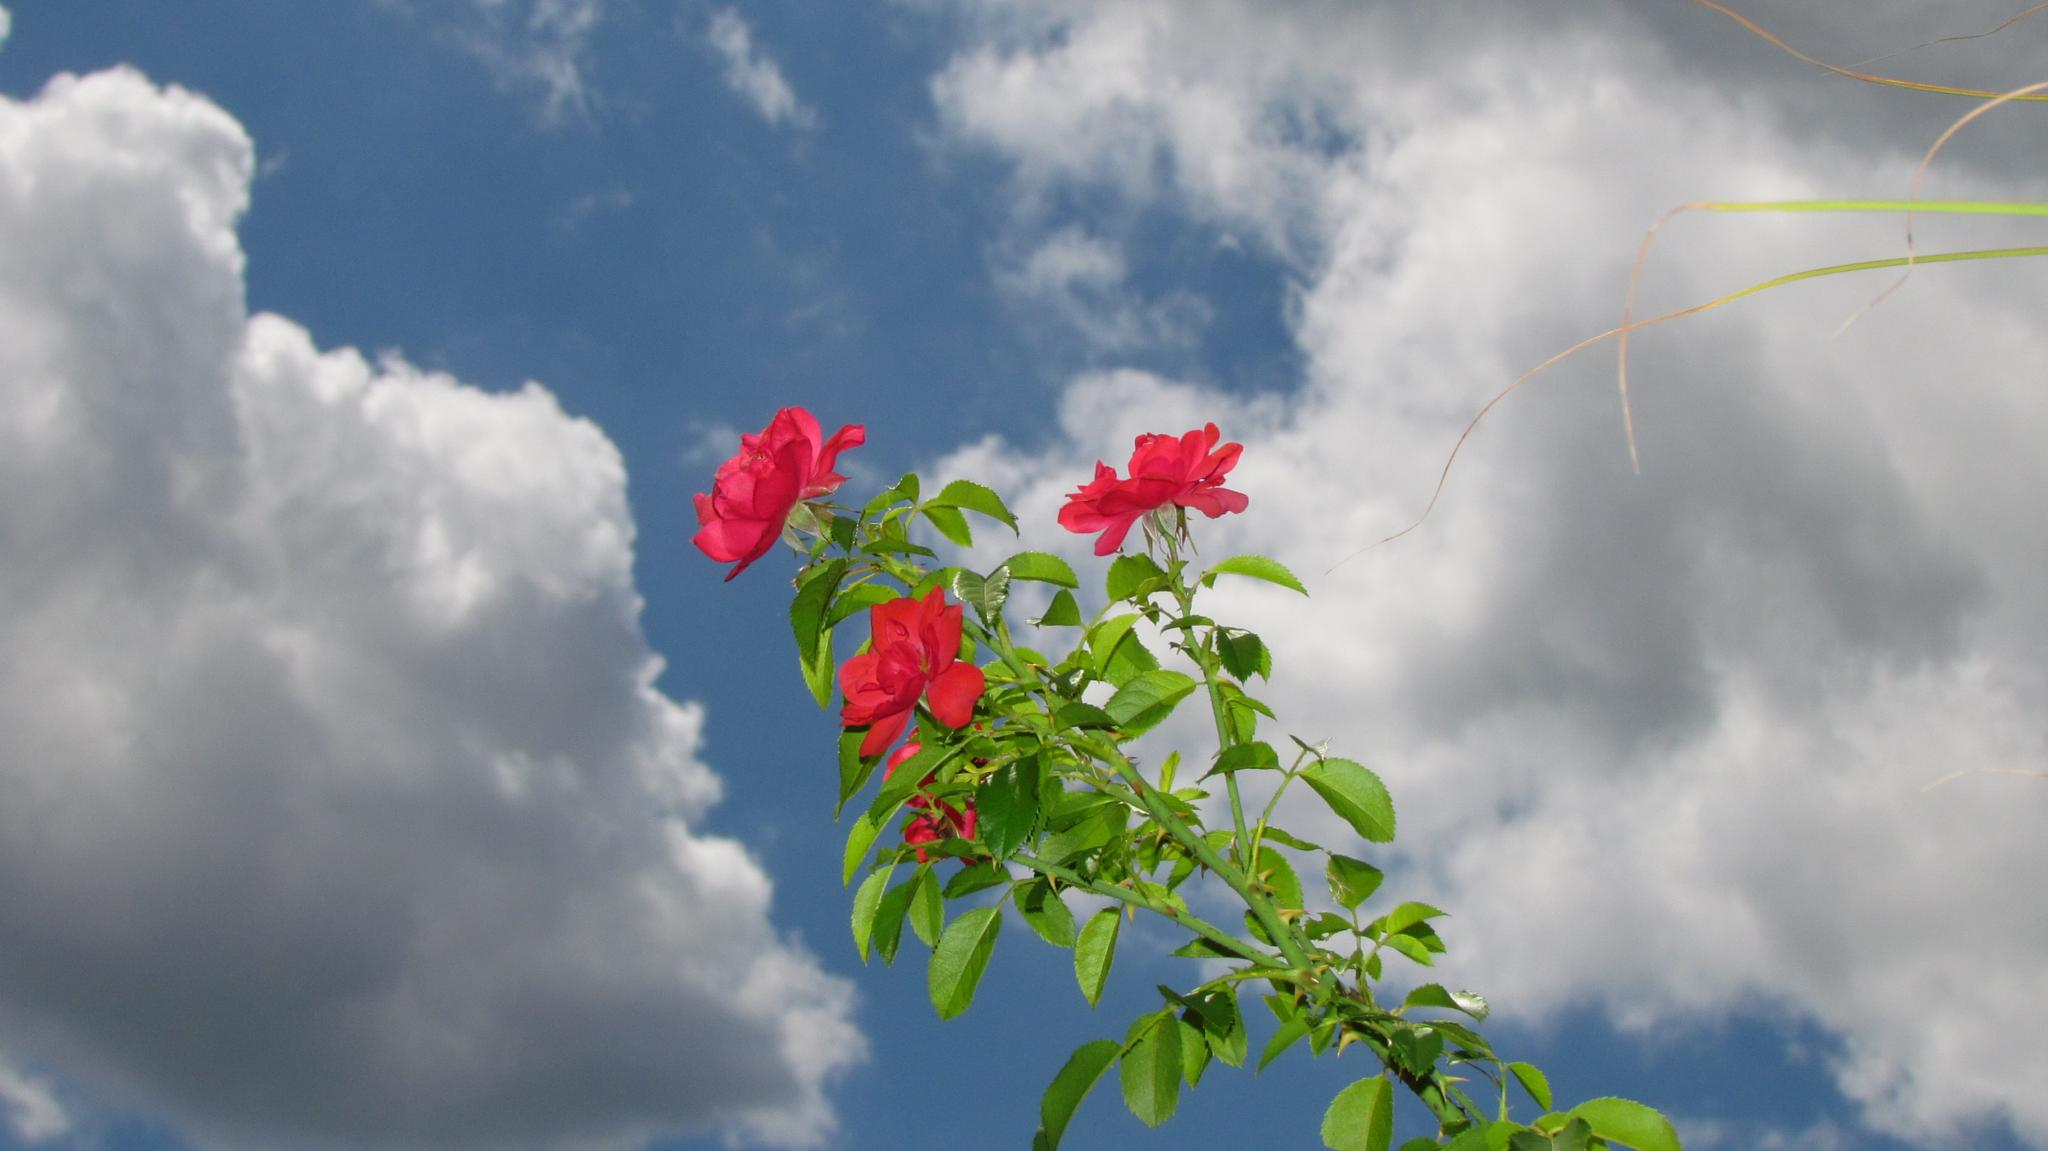 Rose bush-3 by jaisikand